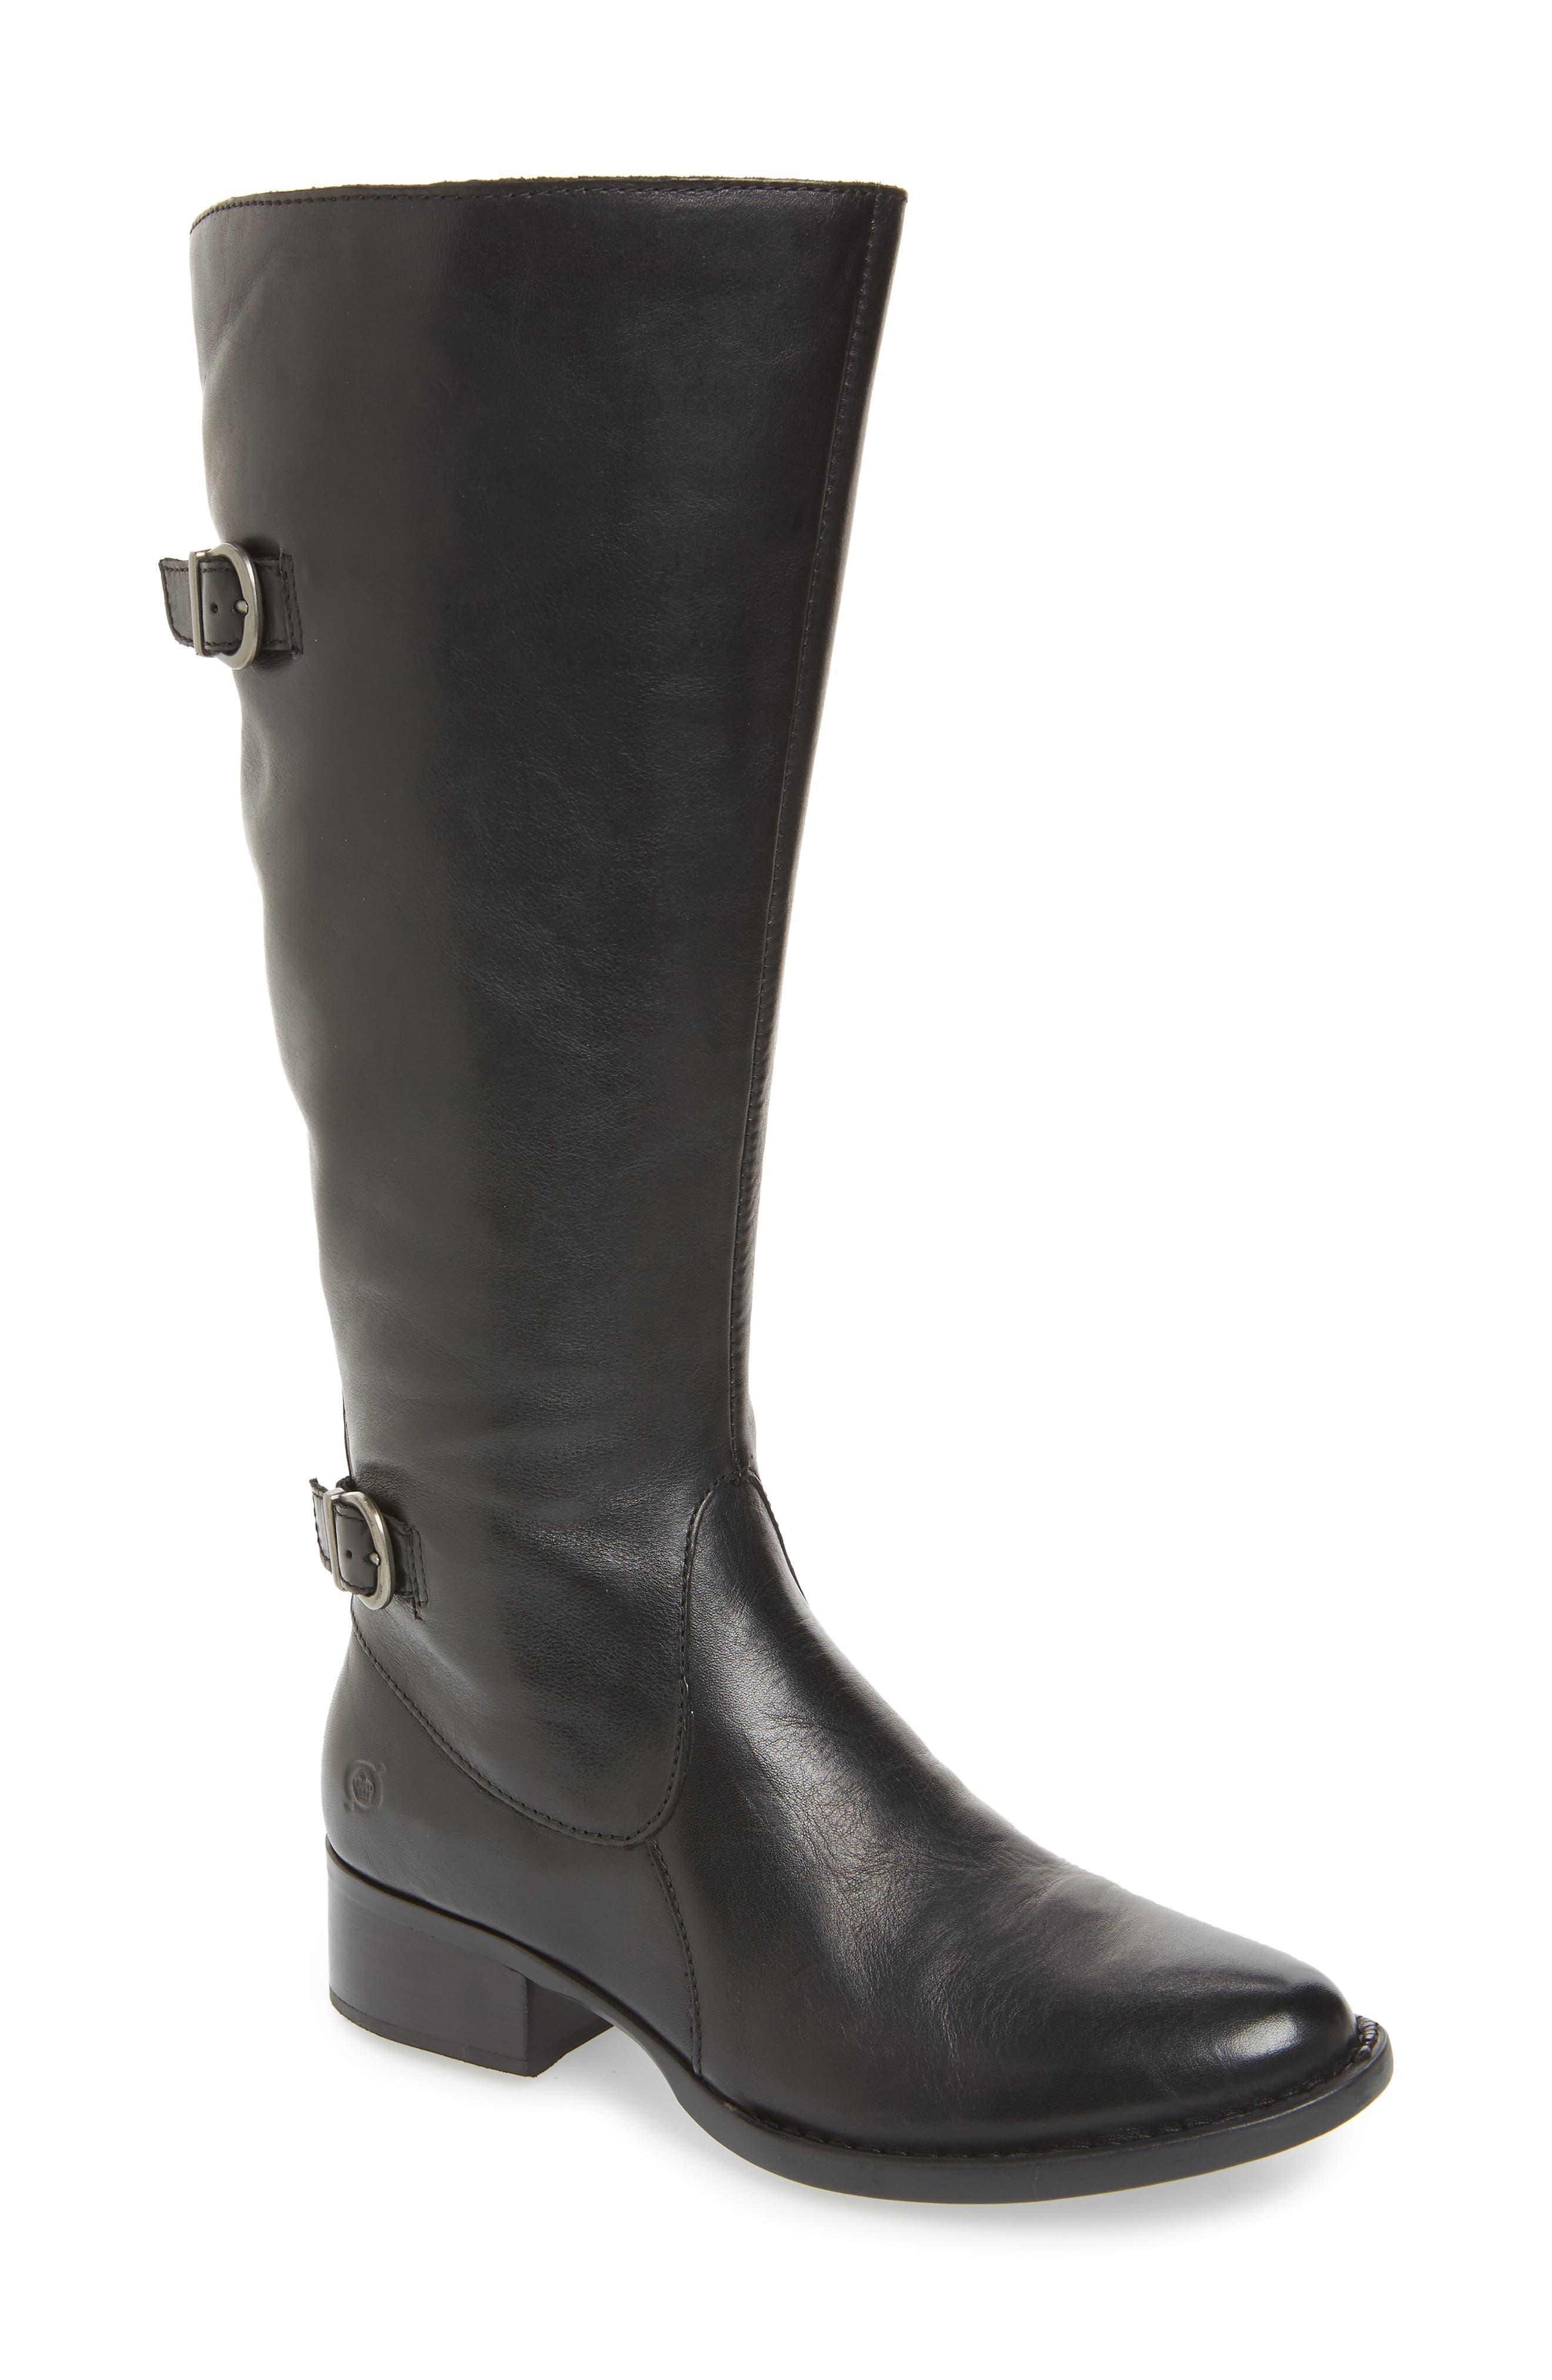 BØRN Gibb Knee High Riding Boot, Main, color, BLACK LEATHER